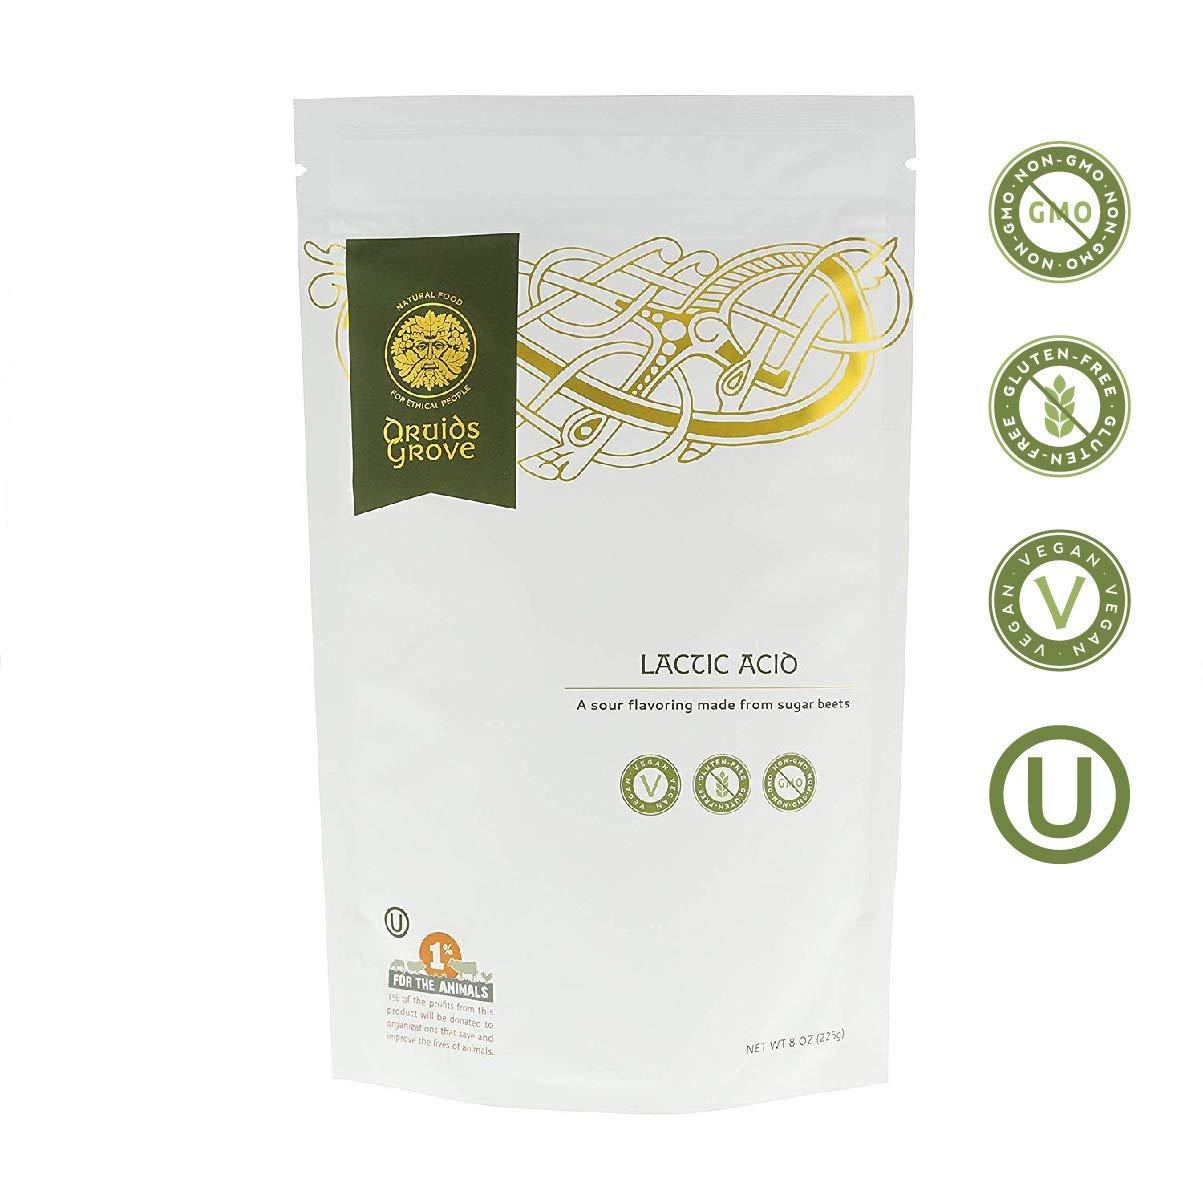 Druids Grove Lactic Acid ☮ Vegan ⊘ Non-GMO ❤ Gluten-Free ✡ OU Kosher Certified - 8 oz.